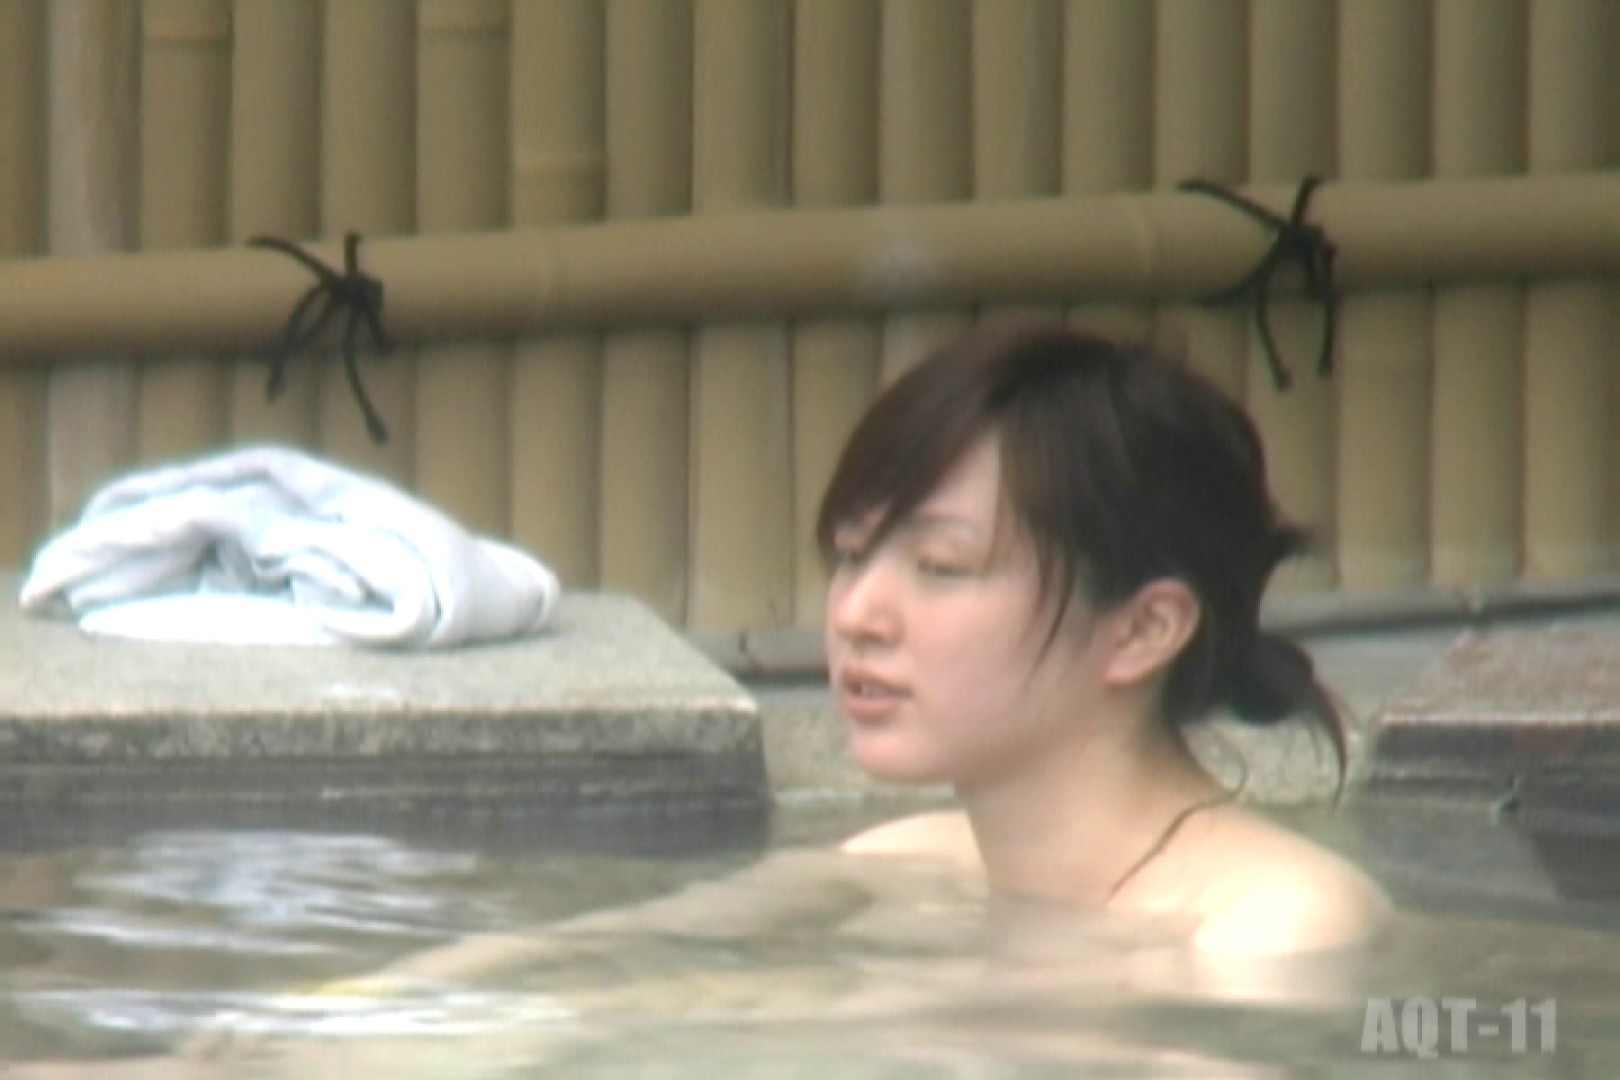 Aquaな露天風呂Vol.798 OL女体  107連発 93